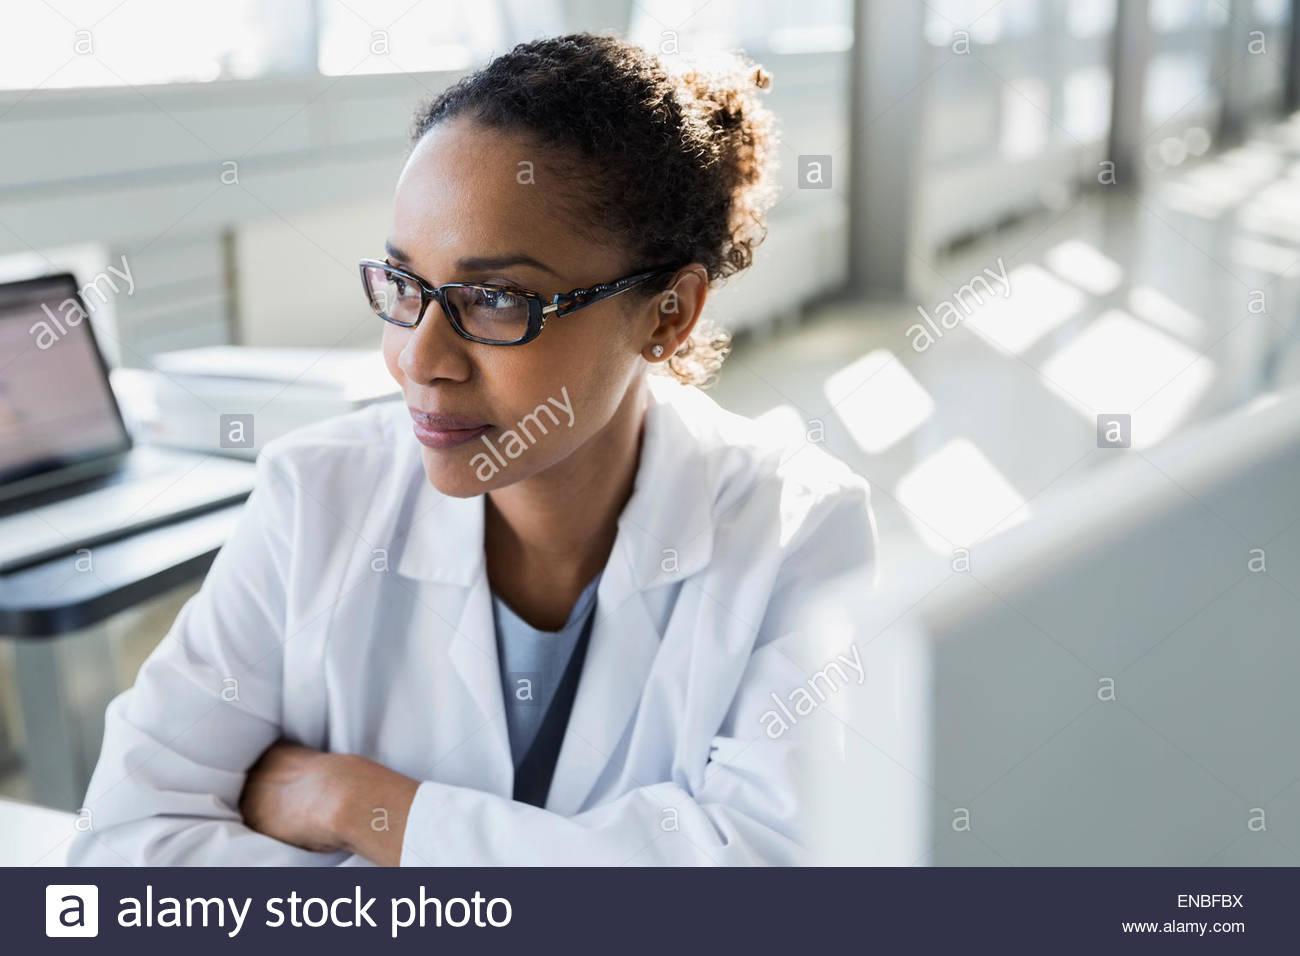 Nachdenkliche Wissenschaftler am Computer wegschauen Stockbild